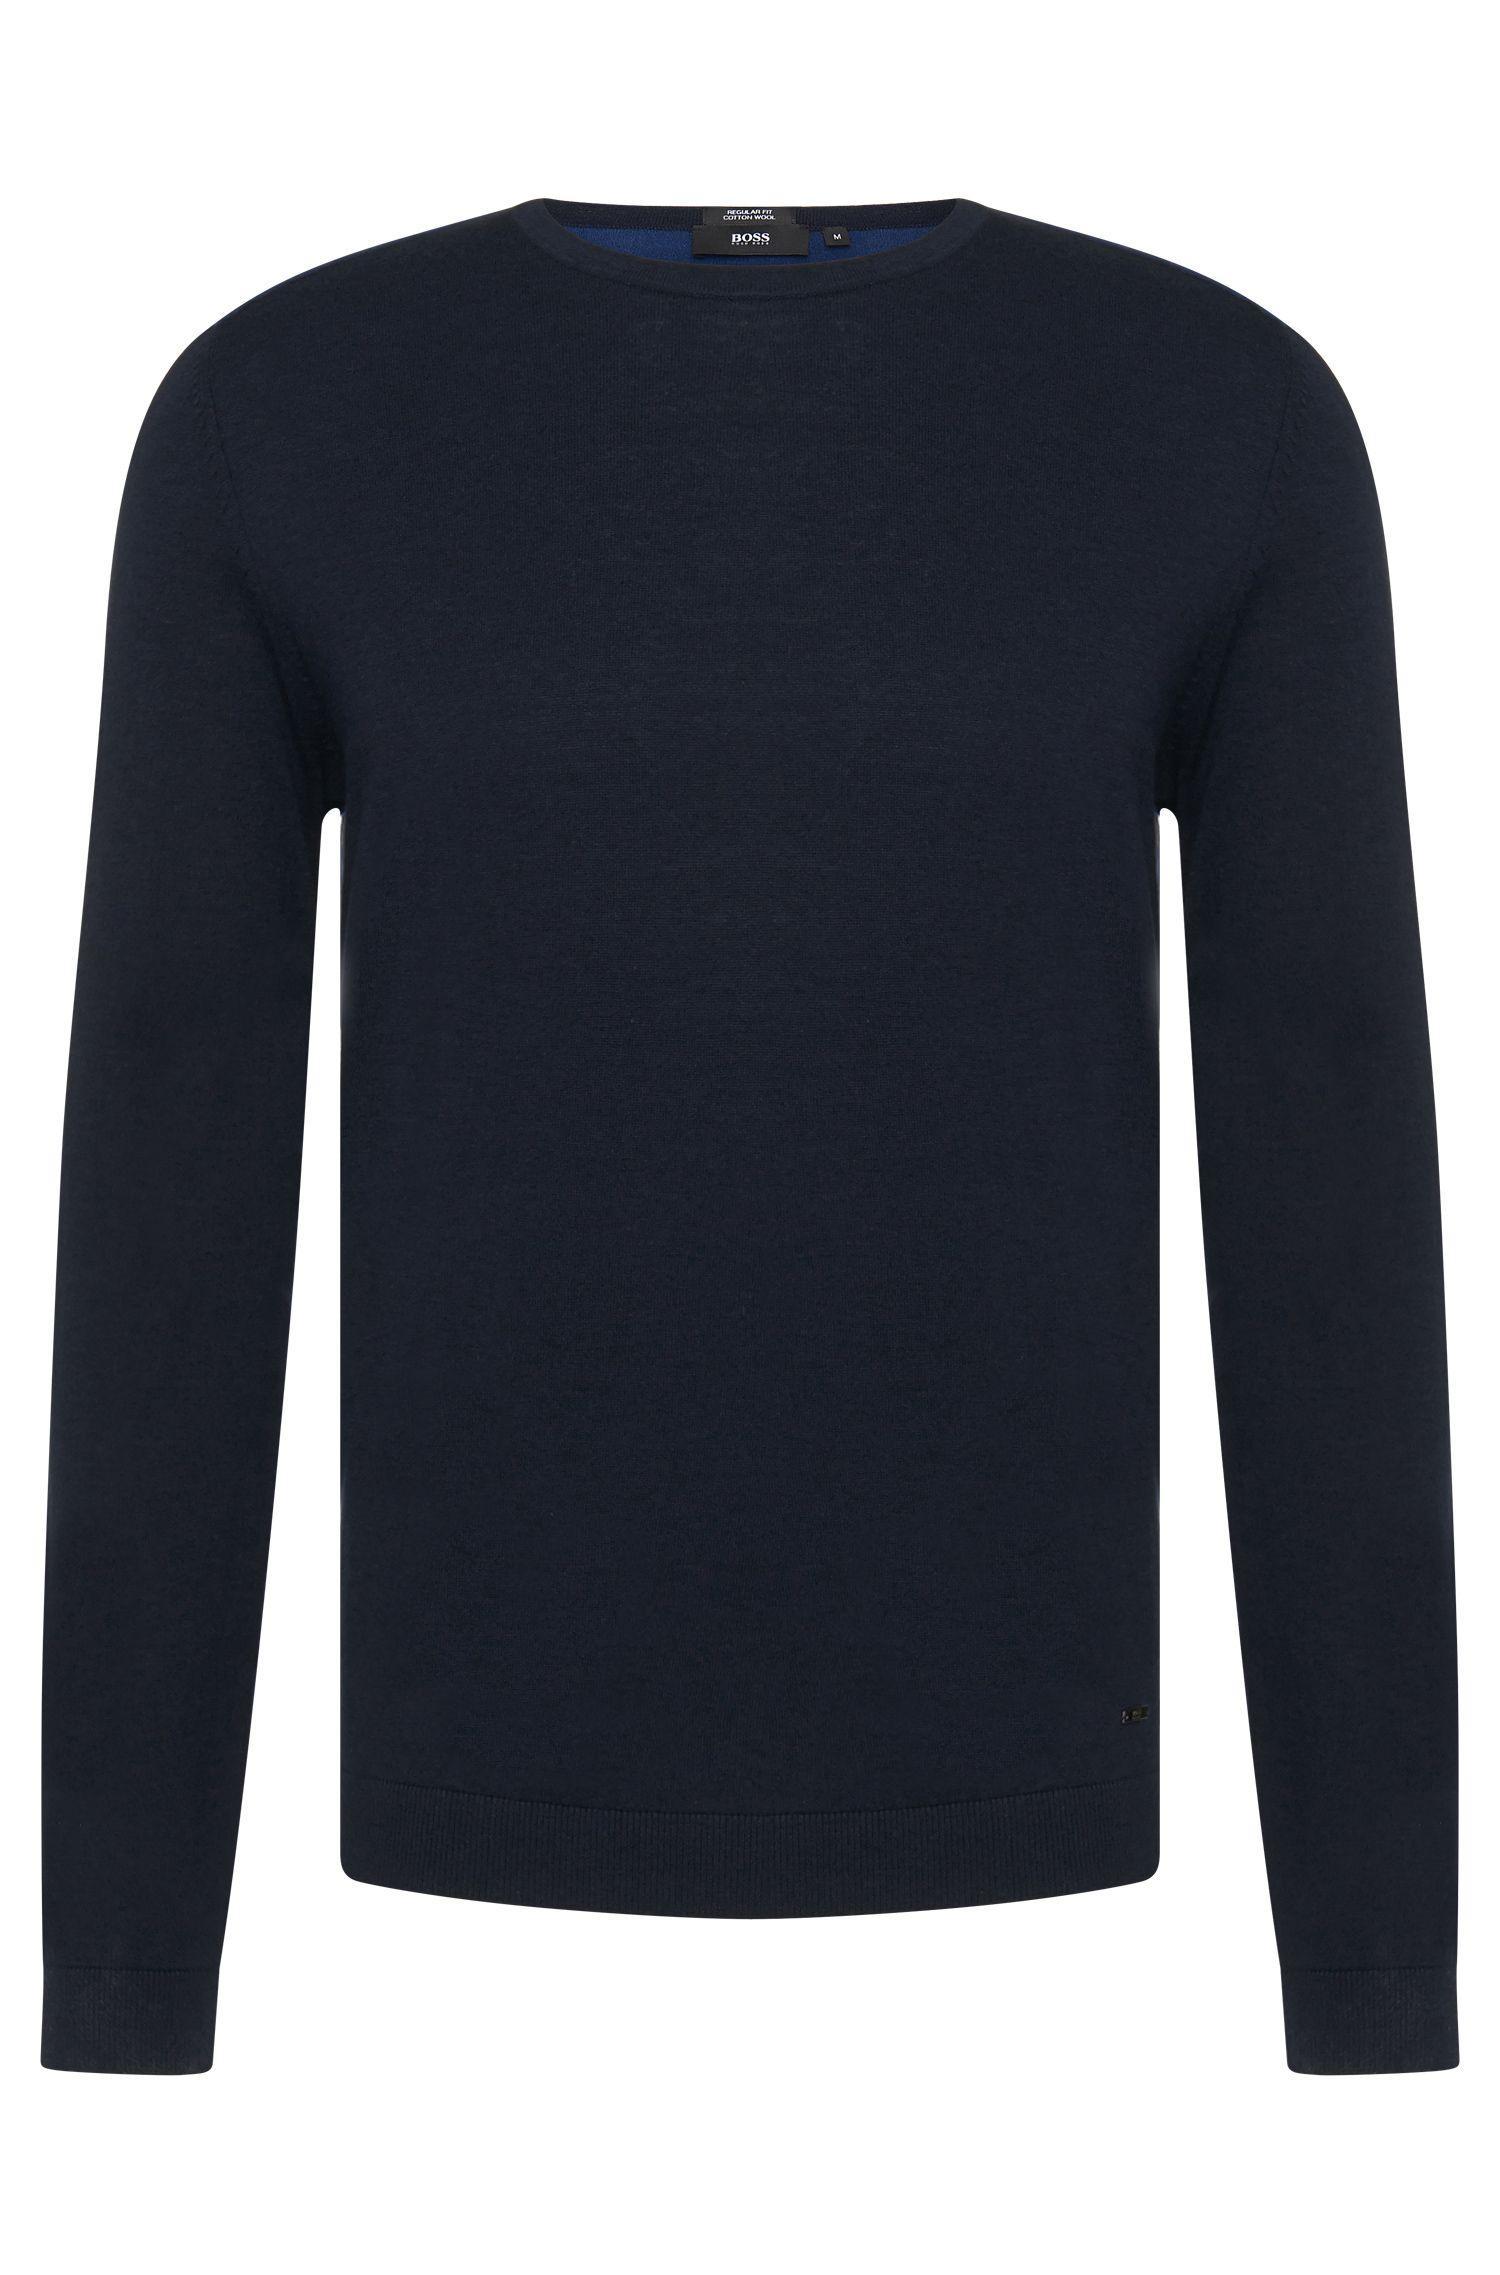 'Bocci'   Virgin Wool Cotton Colorblocked Sweater